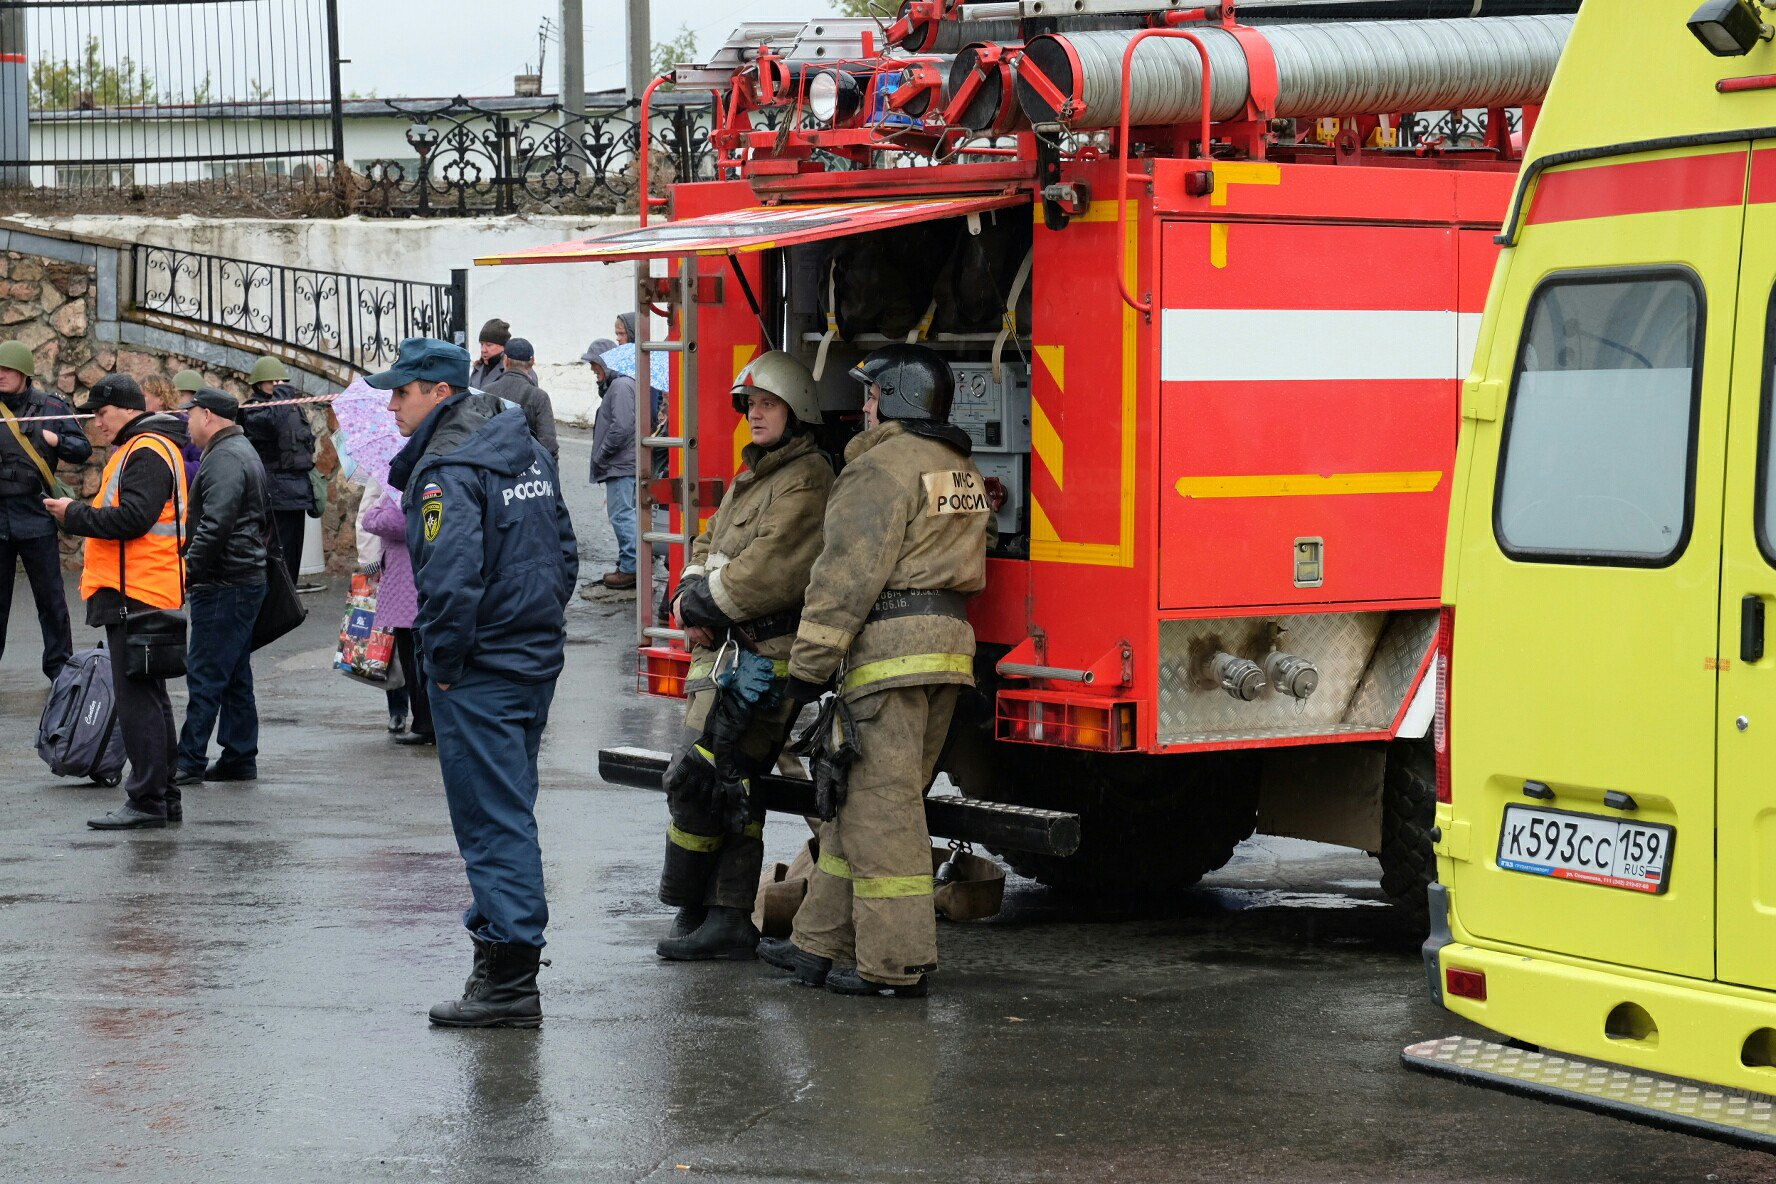 На вокзале до сих пор дежурят спасатели